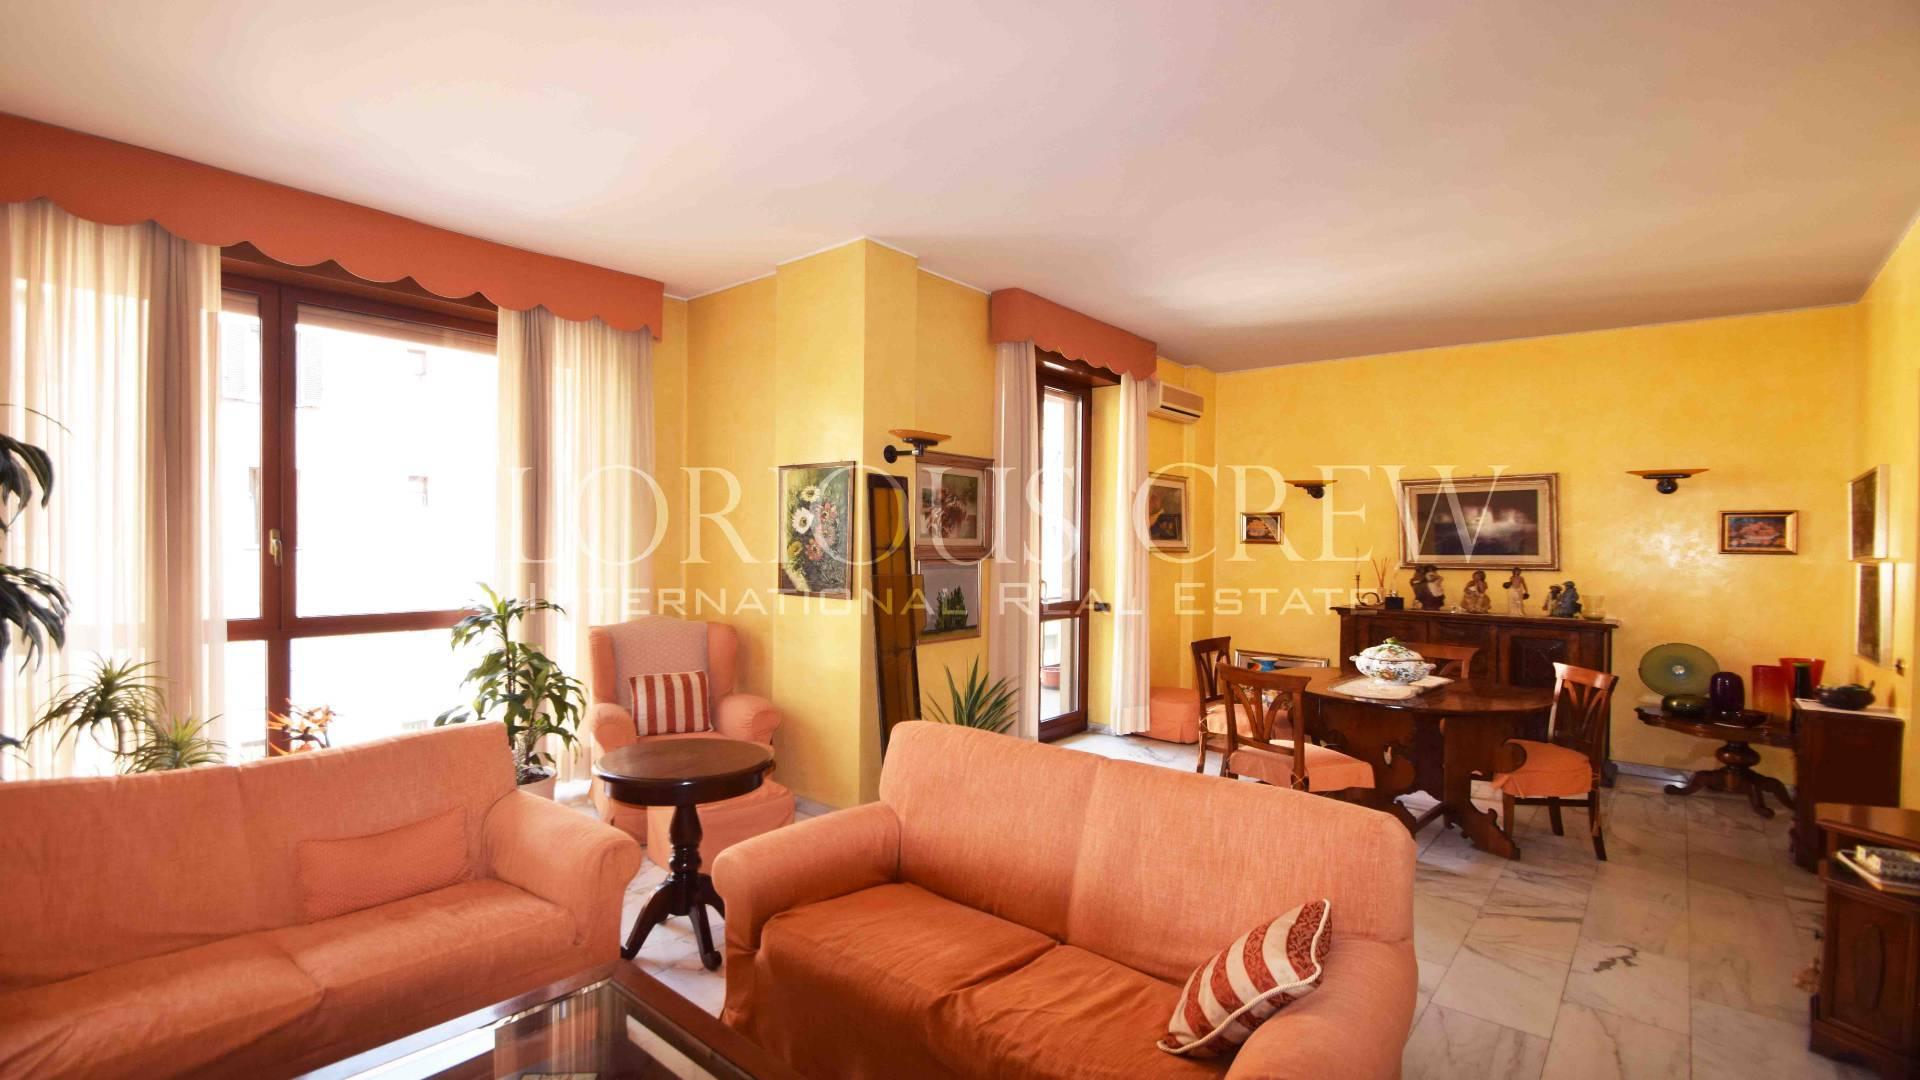 Appartamento in Vendita a Milano via viale bligny